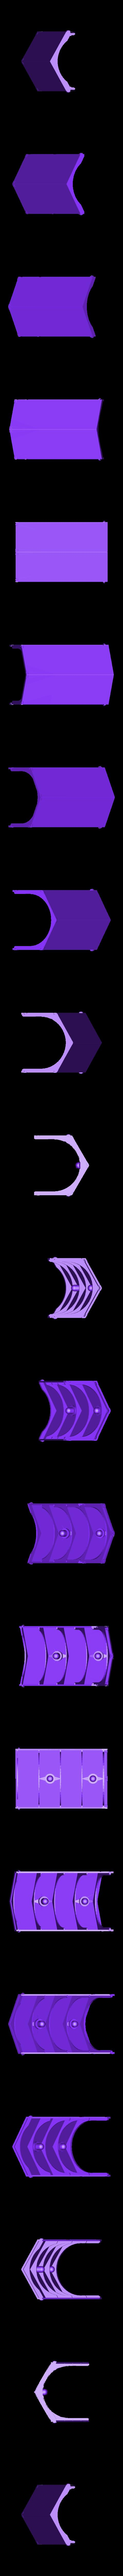 solar array.stl Download free STL file Kepler • 3D printer template, spac3D